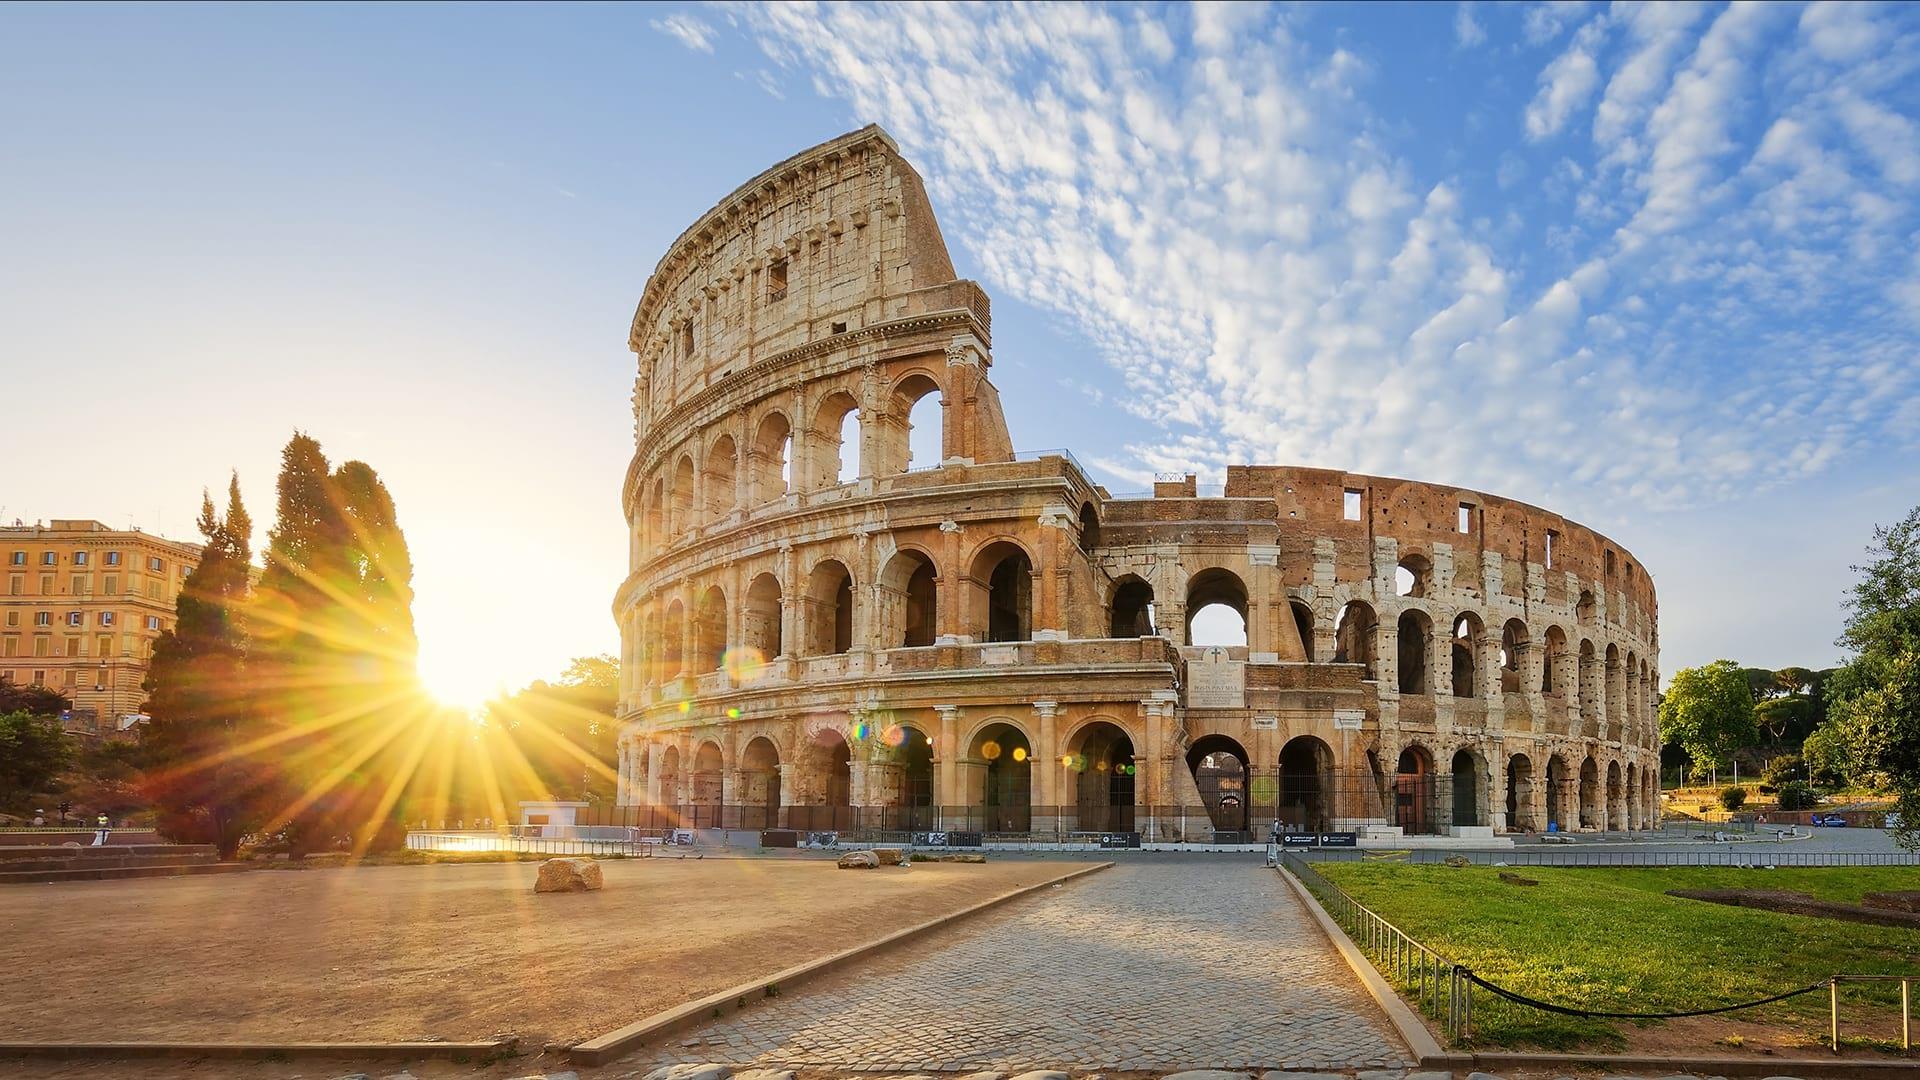 Wieviel Sind Im Eurojackpot